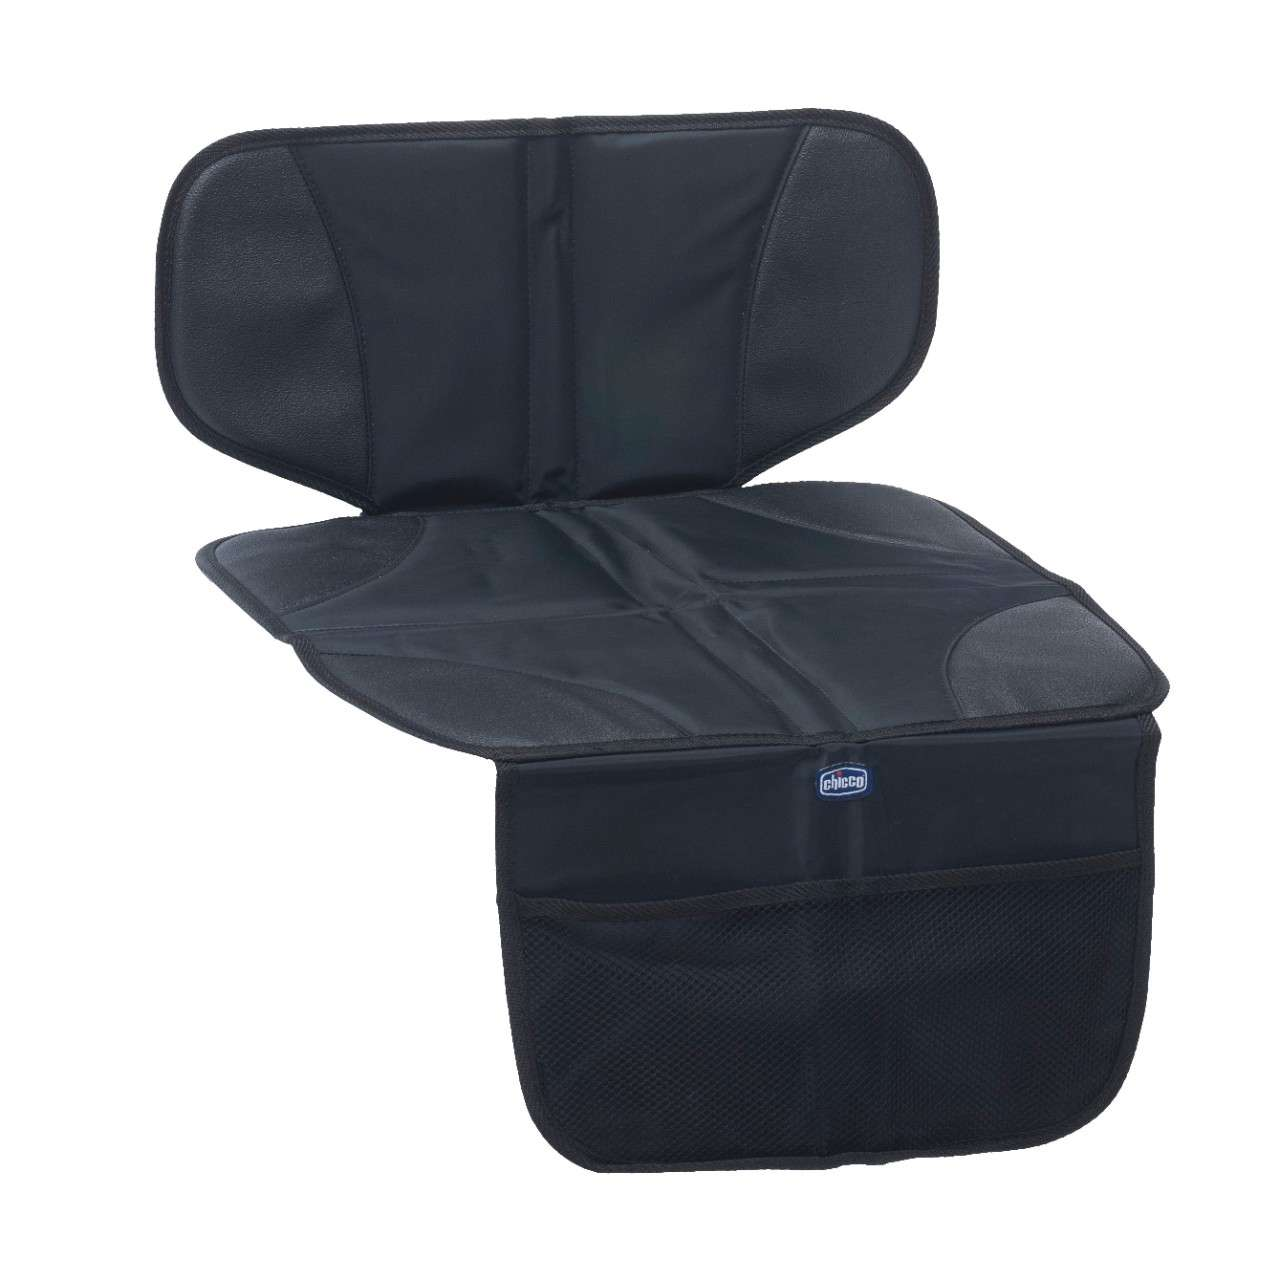 schonauflage deluxe f r fahrzeugsitze im auto chicco de. Black Bedroom Furniture Sets. Home Design Ideas